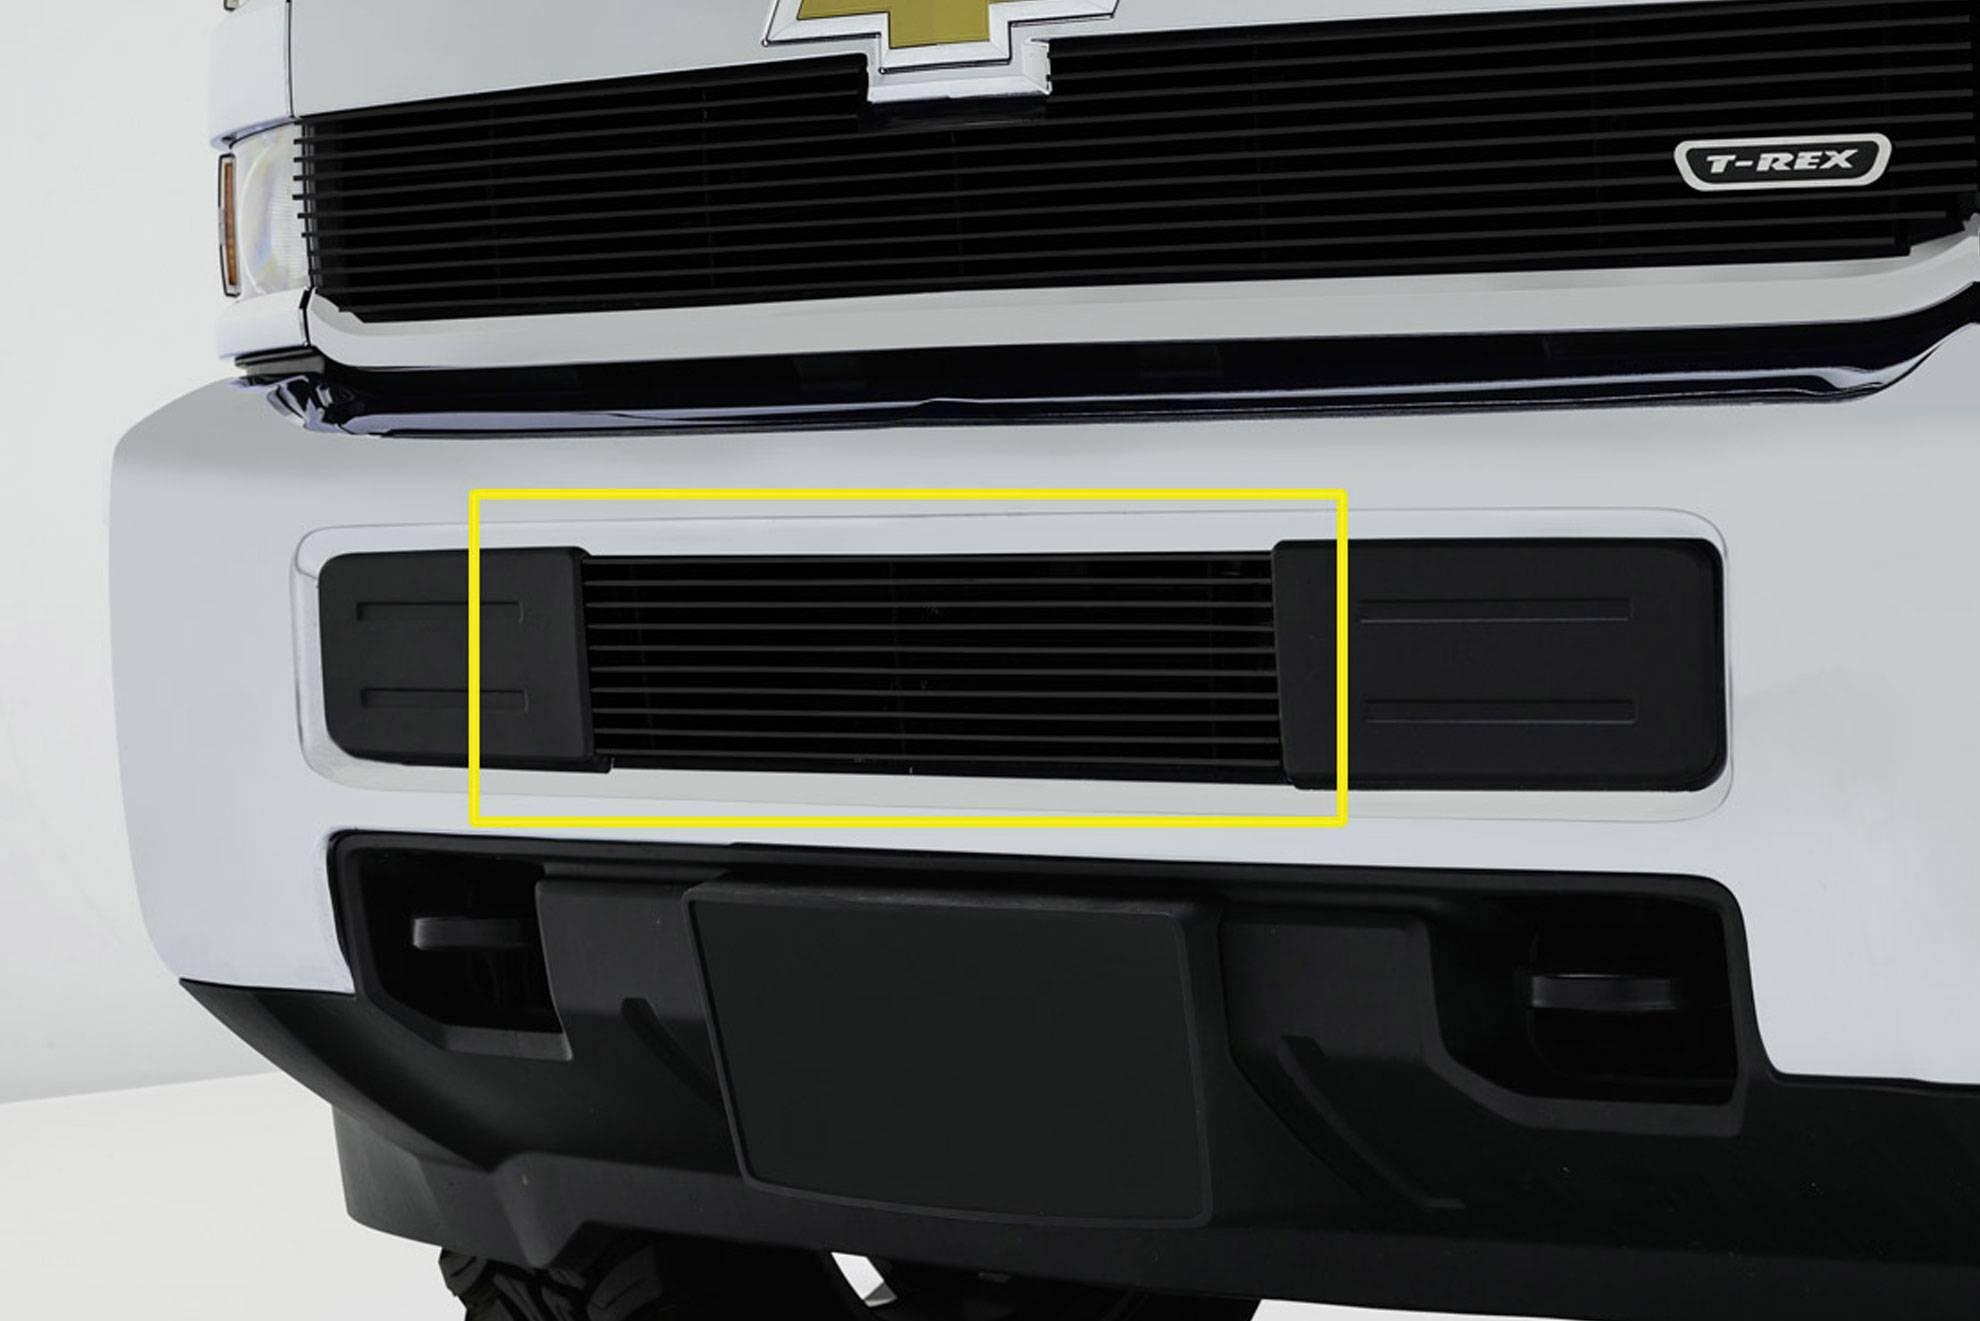 T-REX Grilles - 2015-2019 Silverado 2500, 15-17 3500 Billet Bumper Grille, Black, 1 Pc, Overlay - PN #25122B